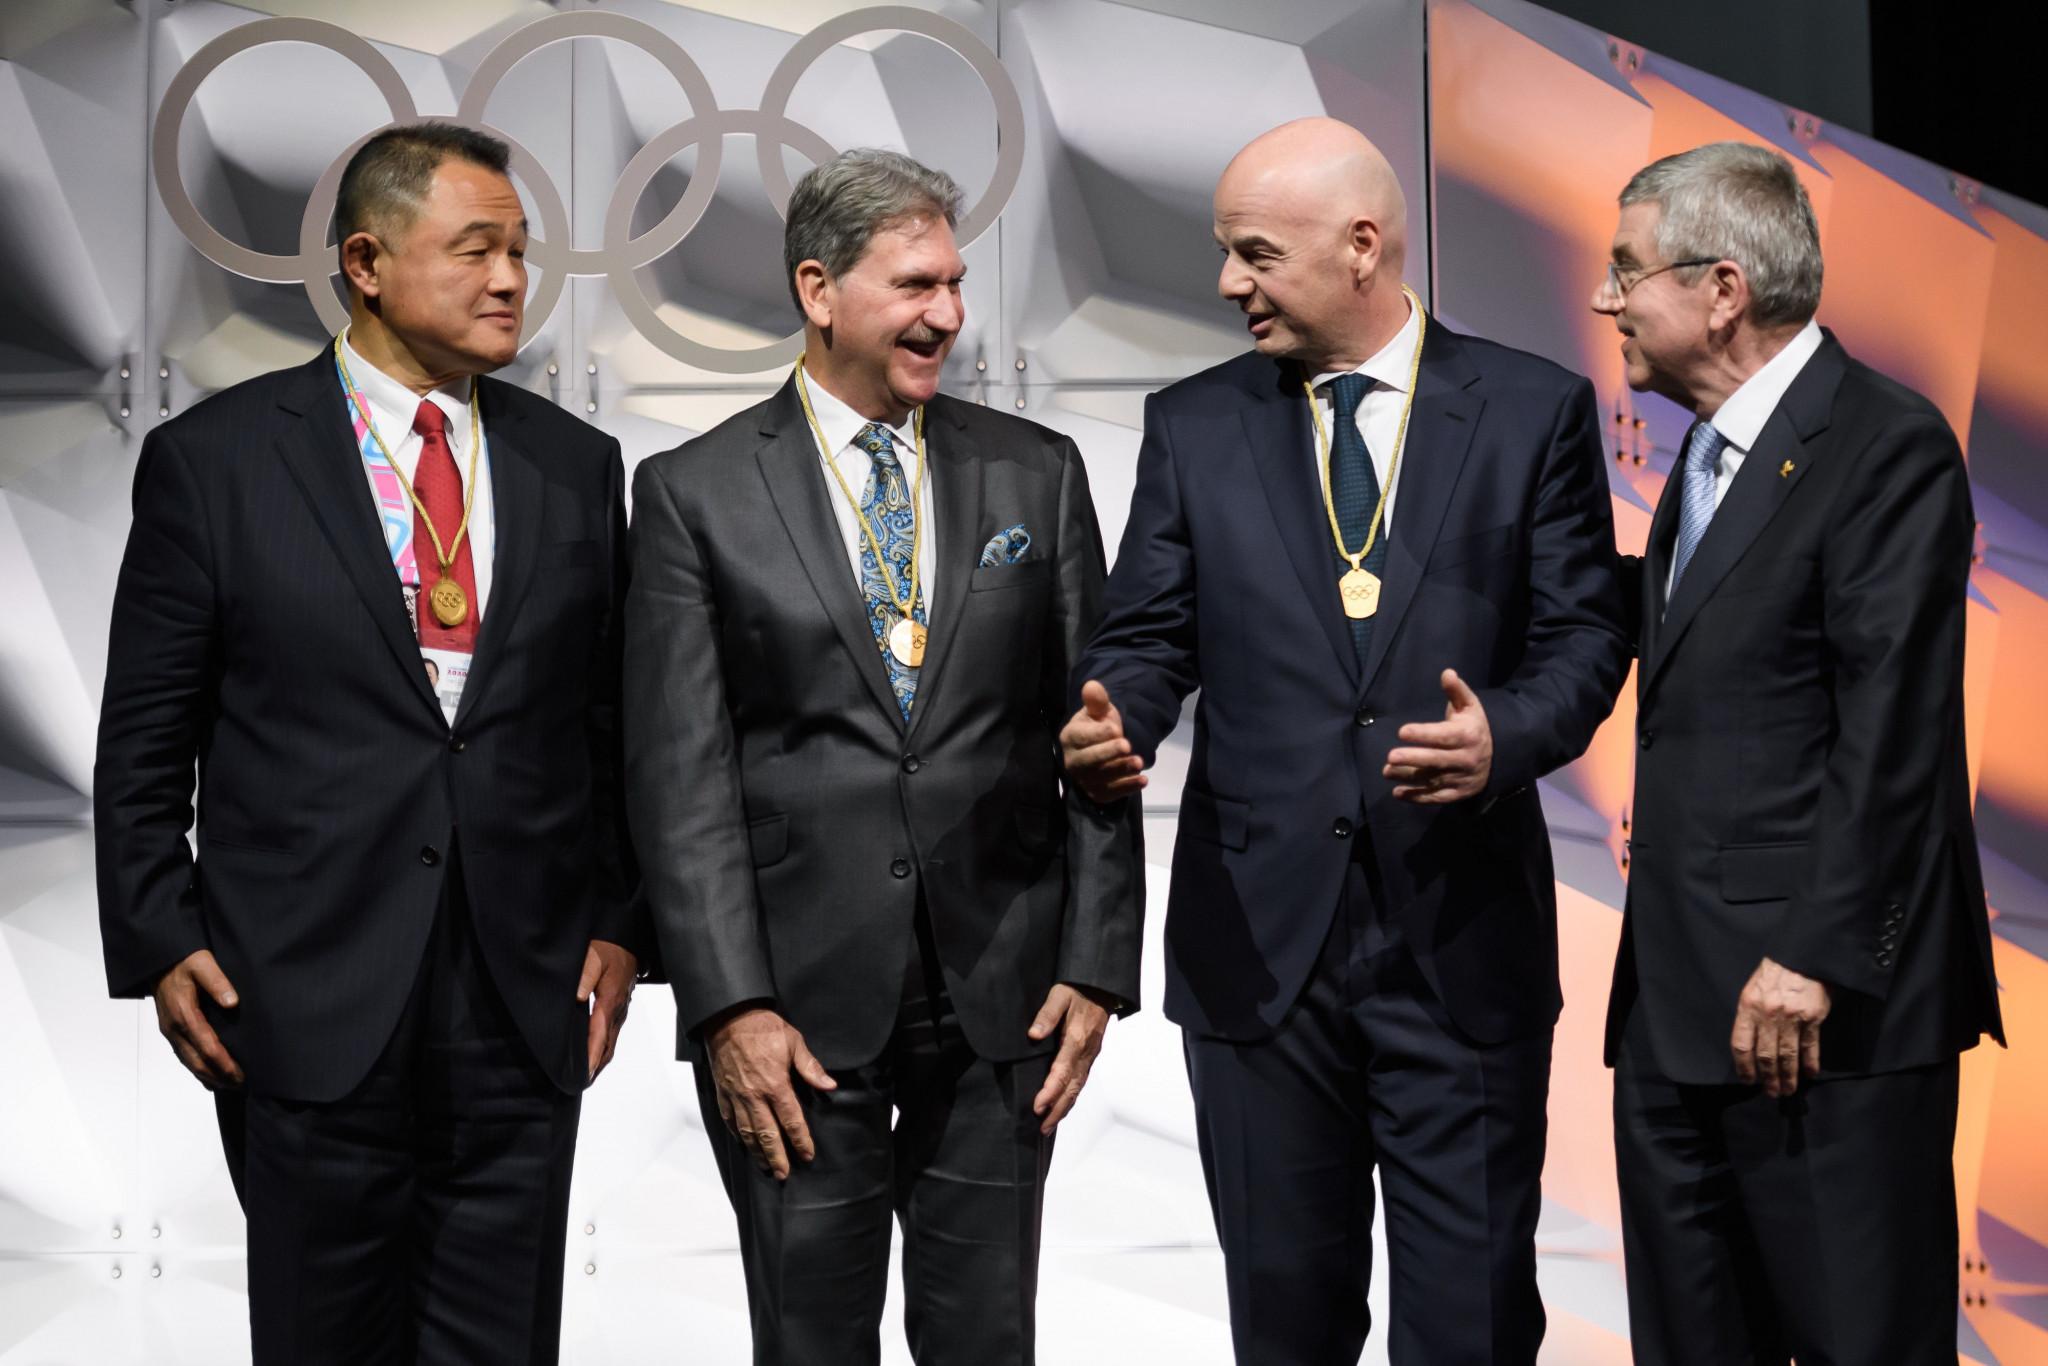 Japanese Olympic Committee (JOC) President Yasuhiro Yamashita and ITF President David Haggerty also joined the IOC ©Getty Images